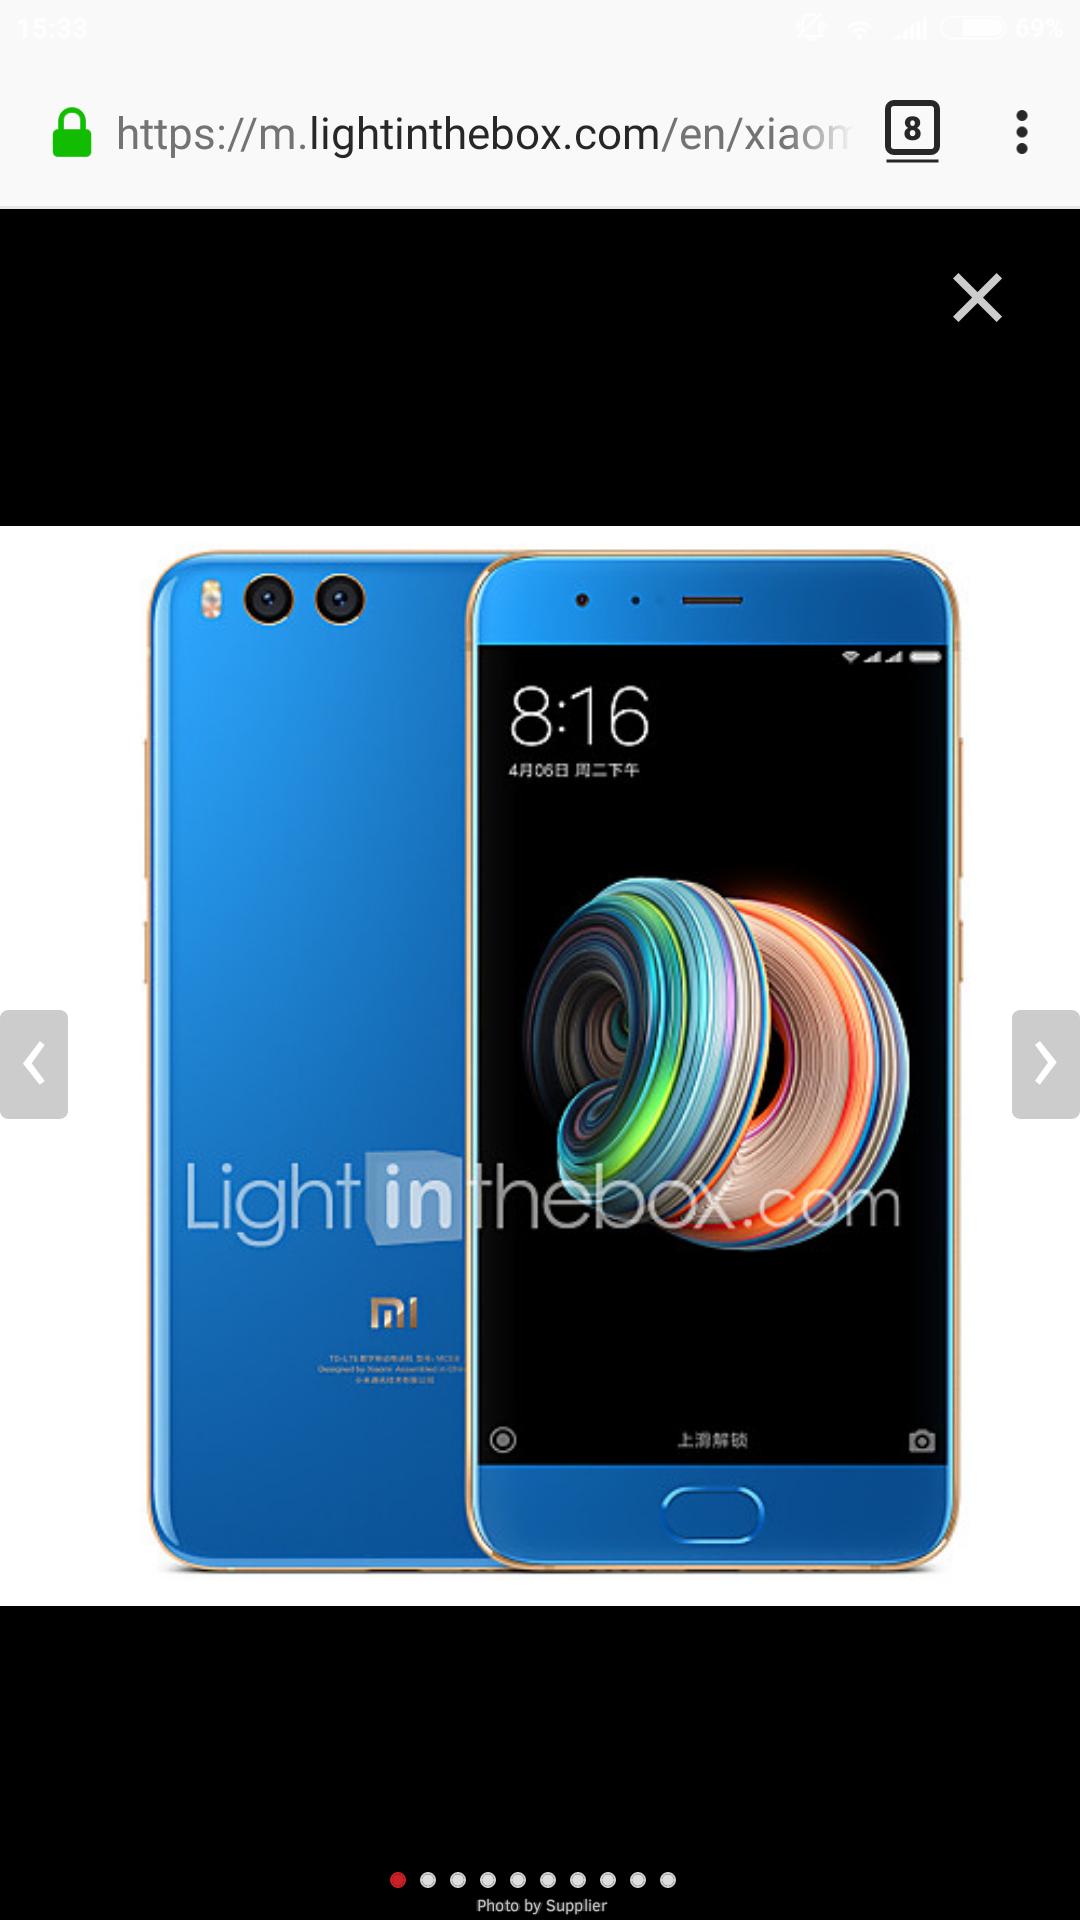 Niebieski Xiaomi mi note 3 6/64